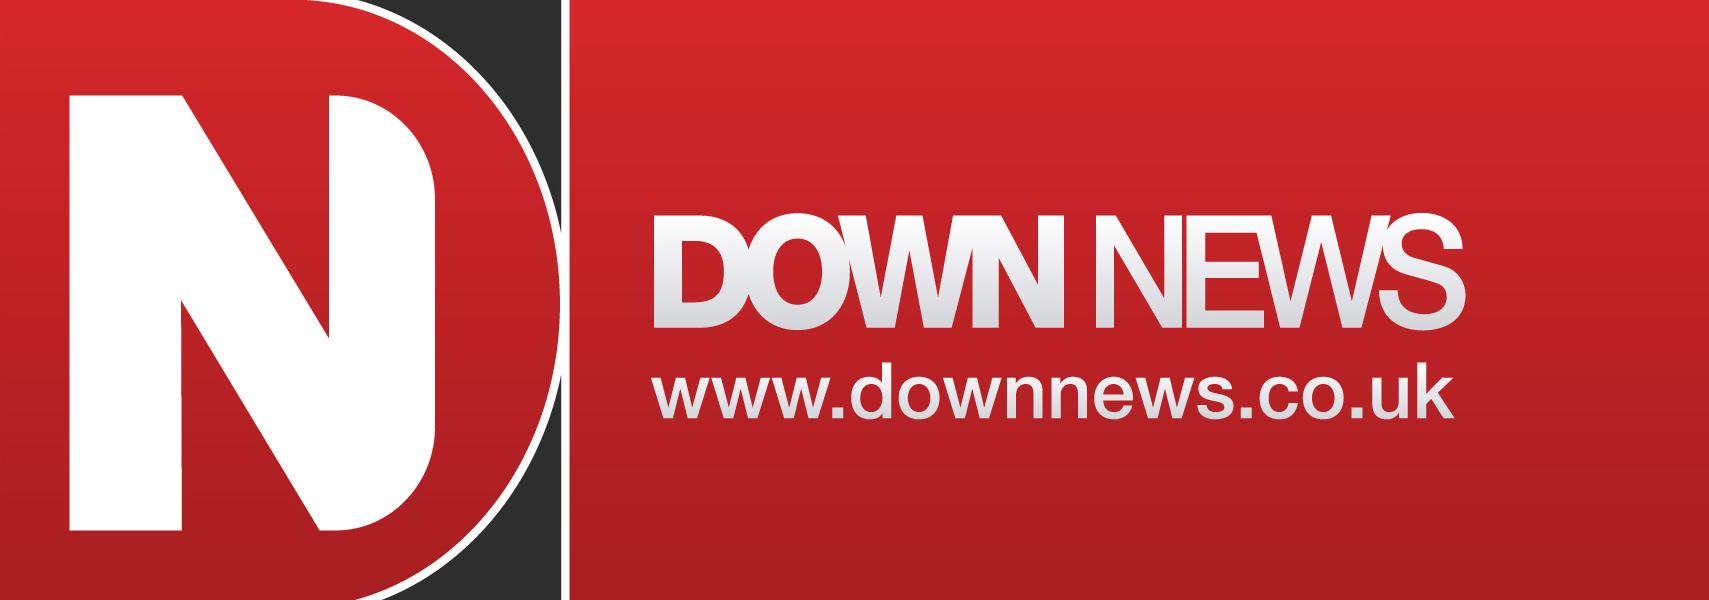 DownNews